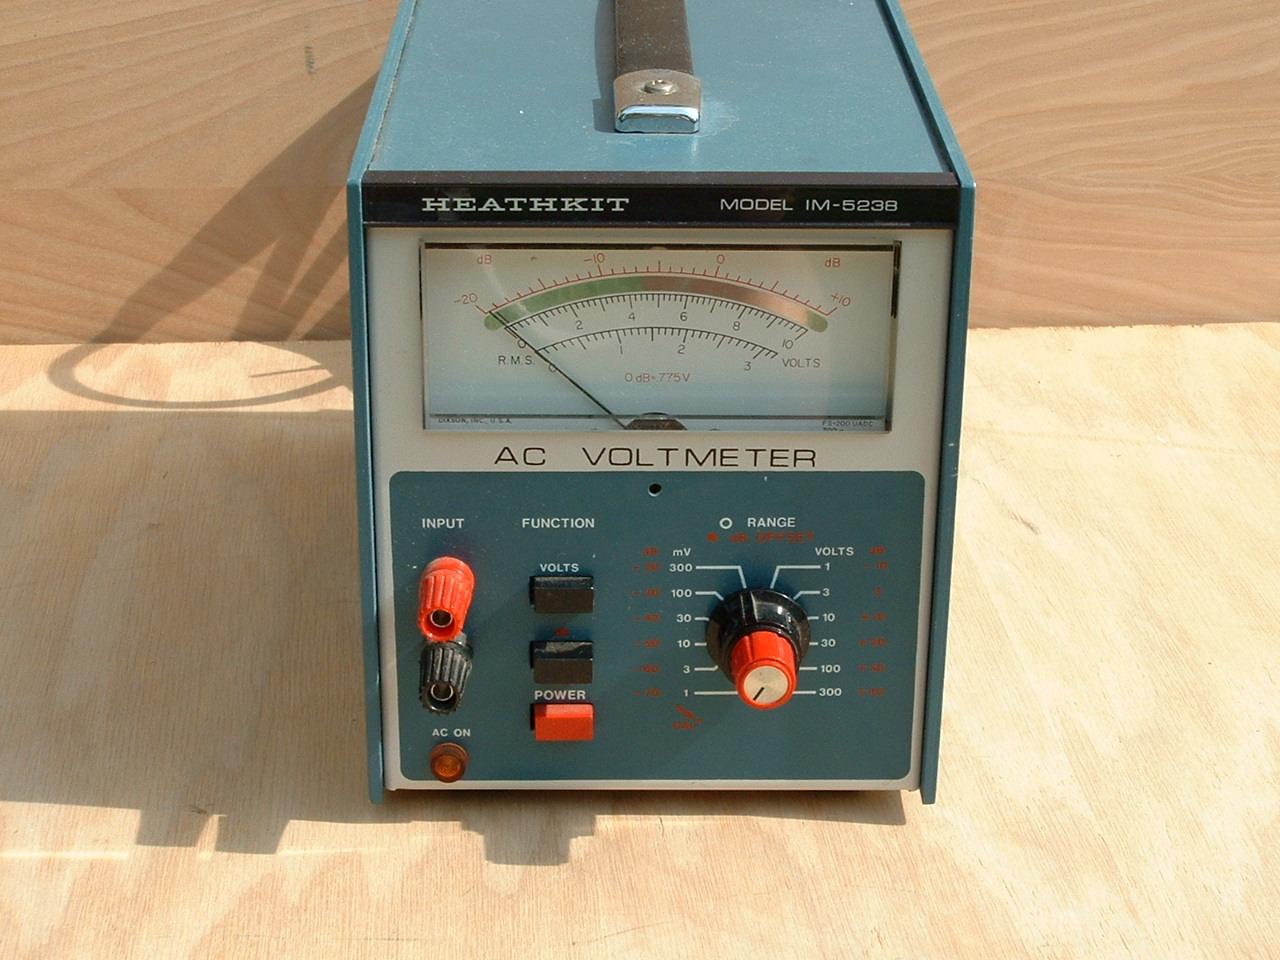 im 5238 rh pestingers net Heathkit Products Heathkit Manuals PDF